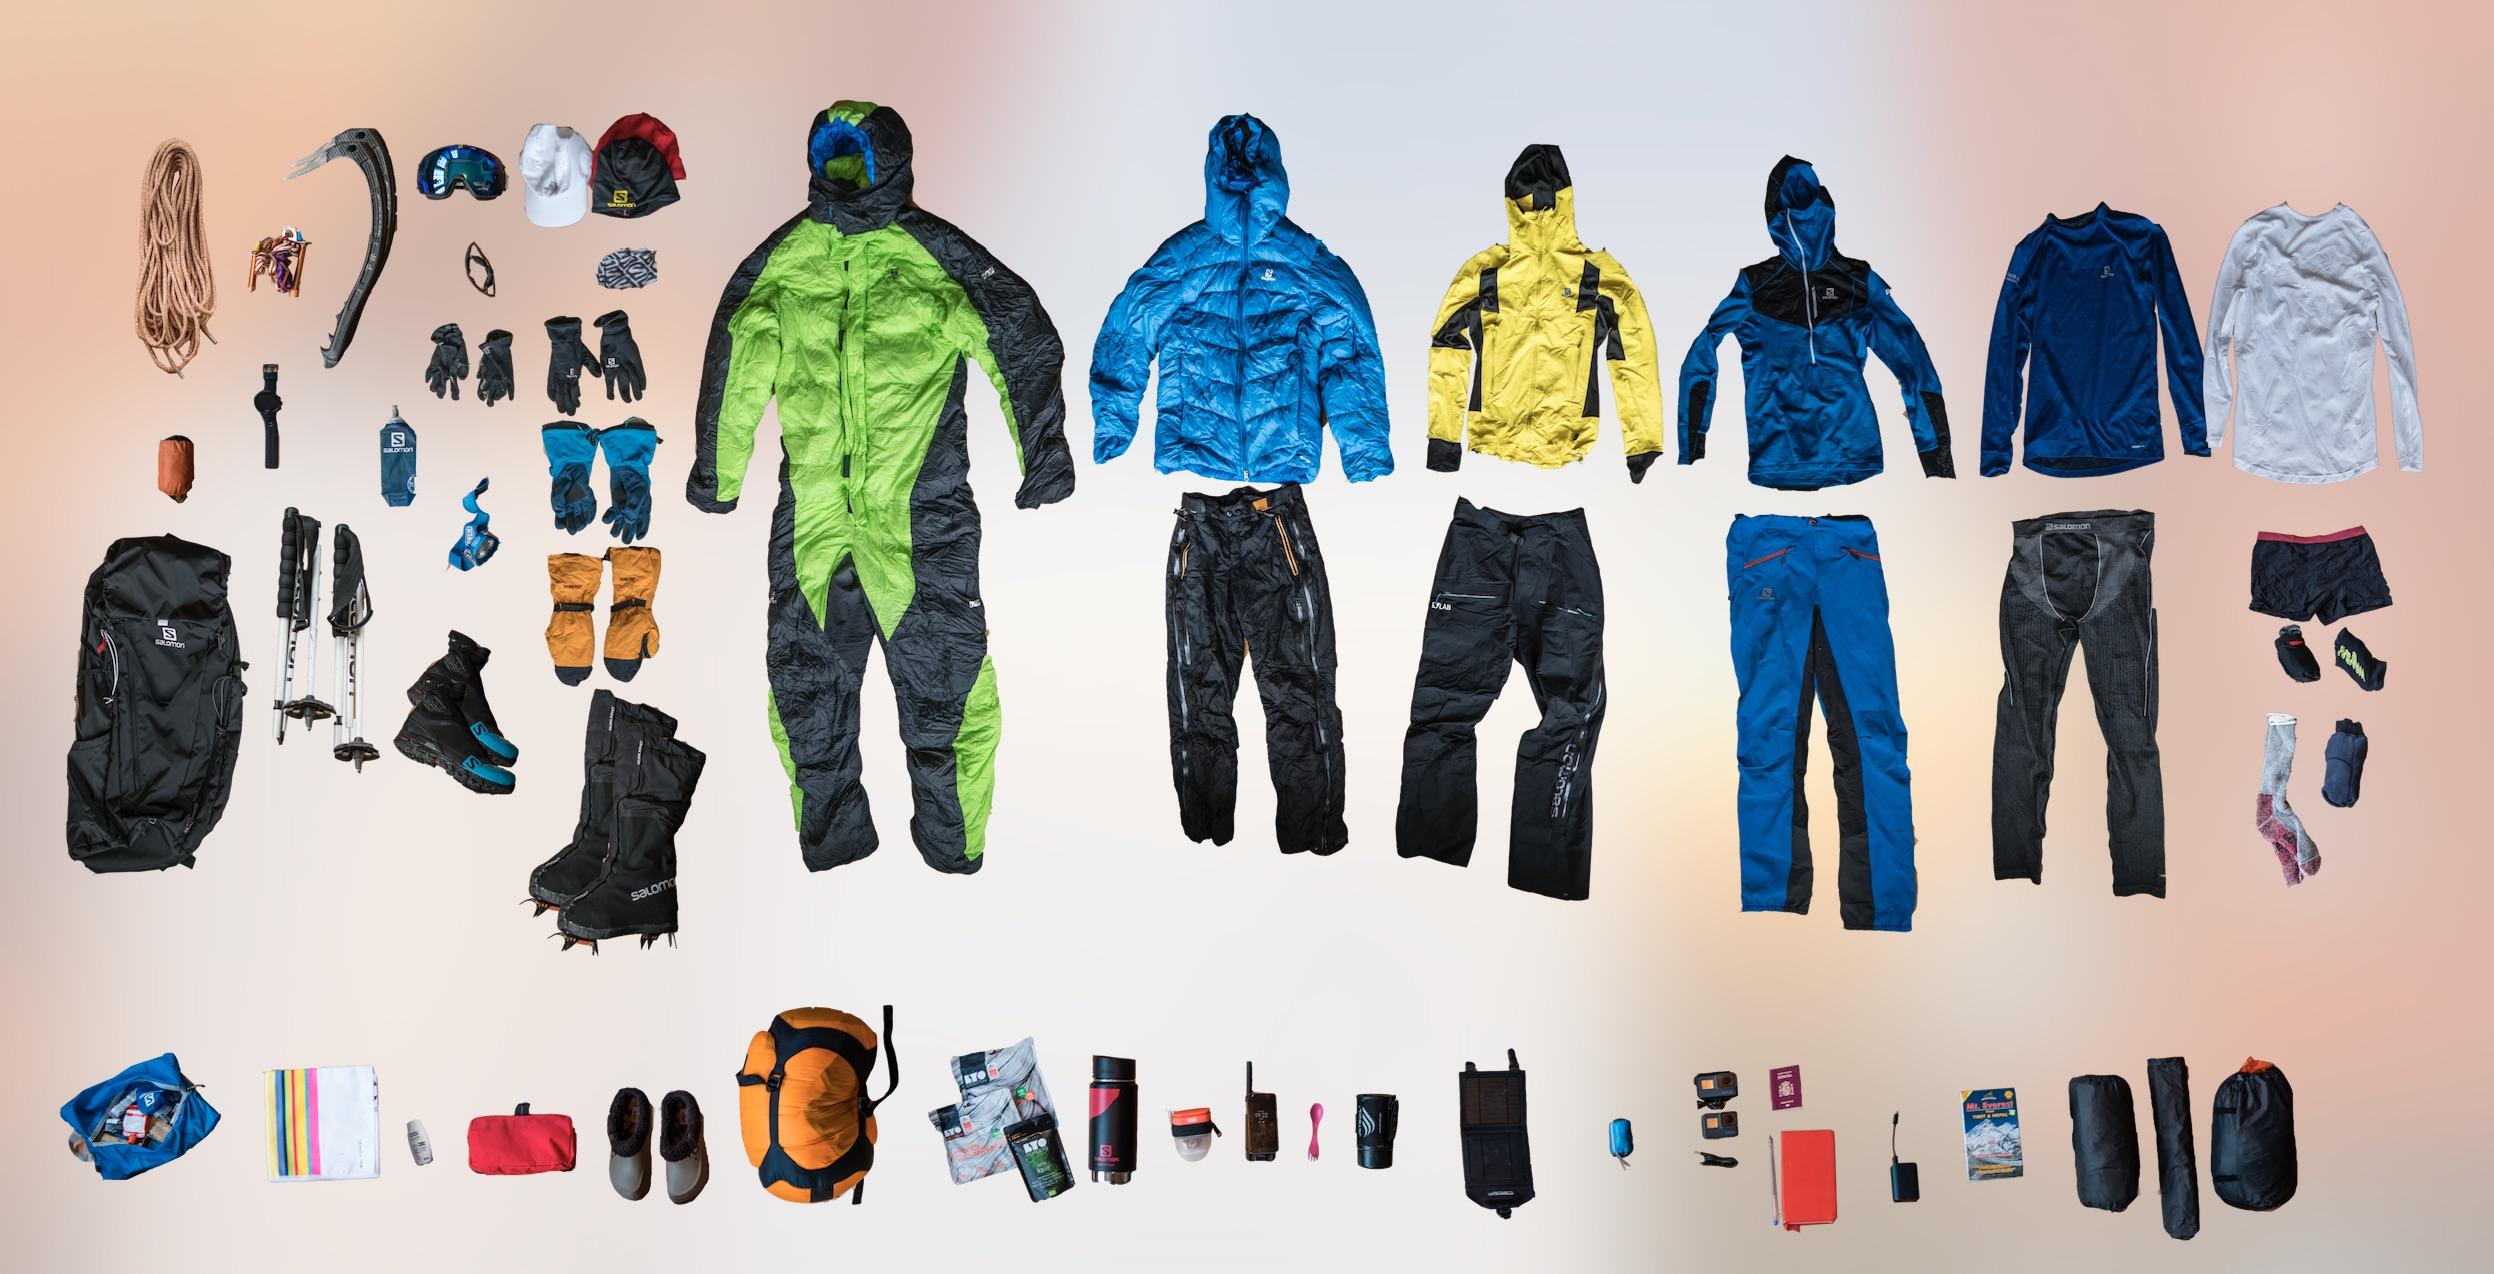 Kilian Jornet_All Gear Everest-2017